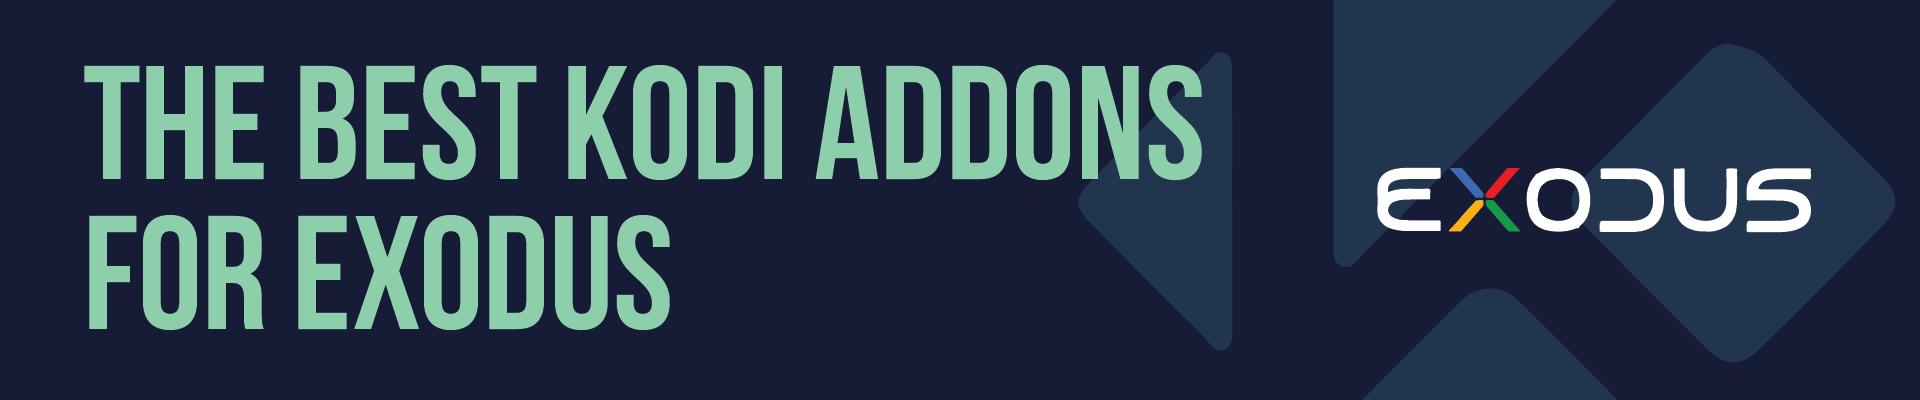 new kodi exodus addon